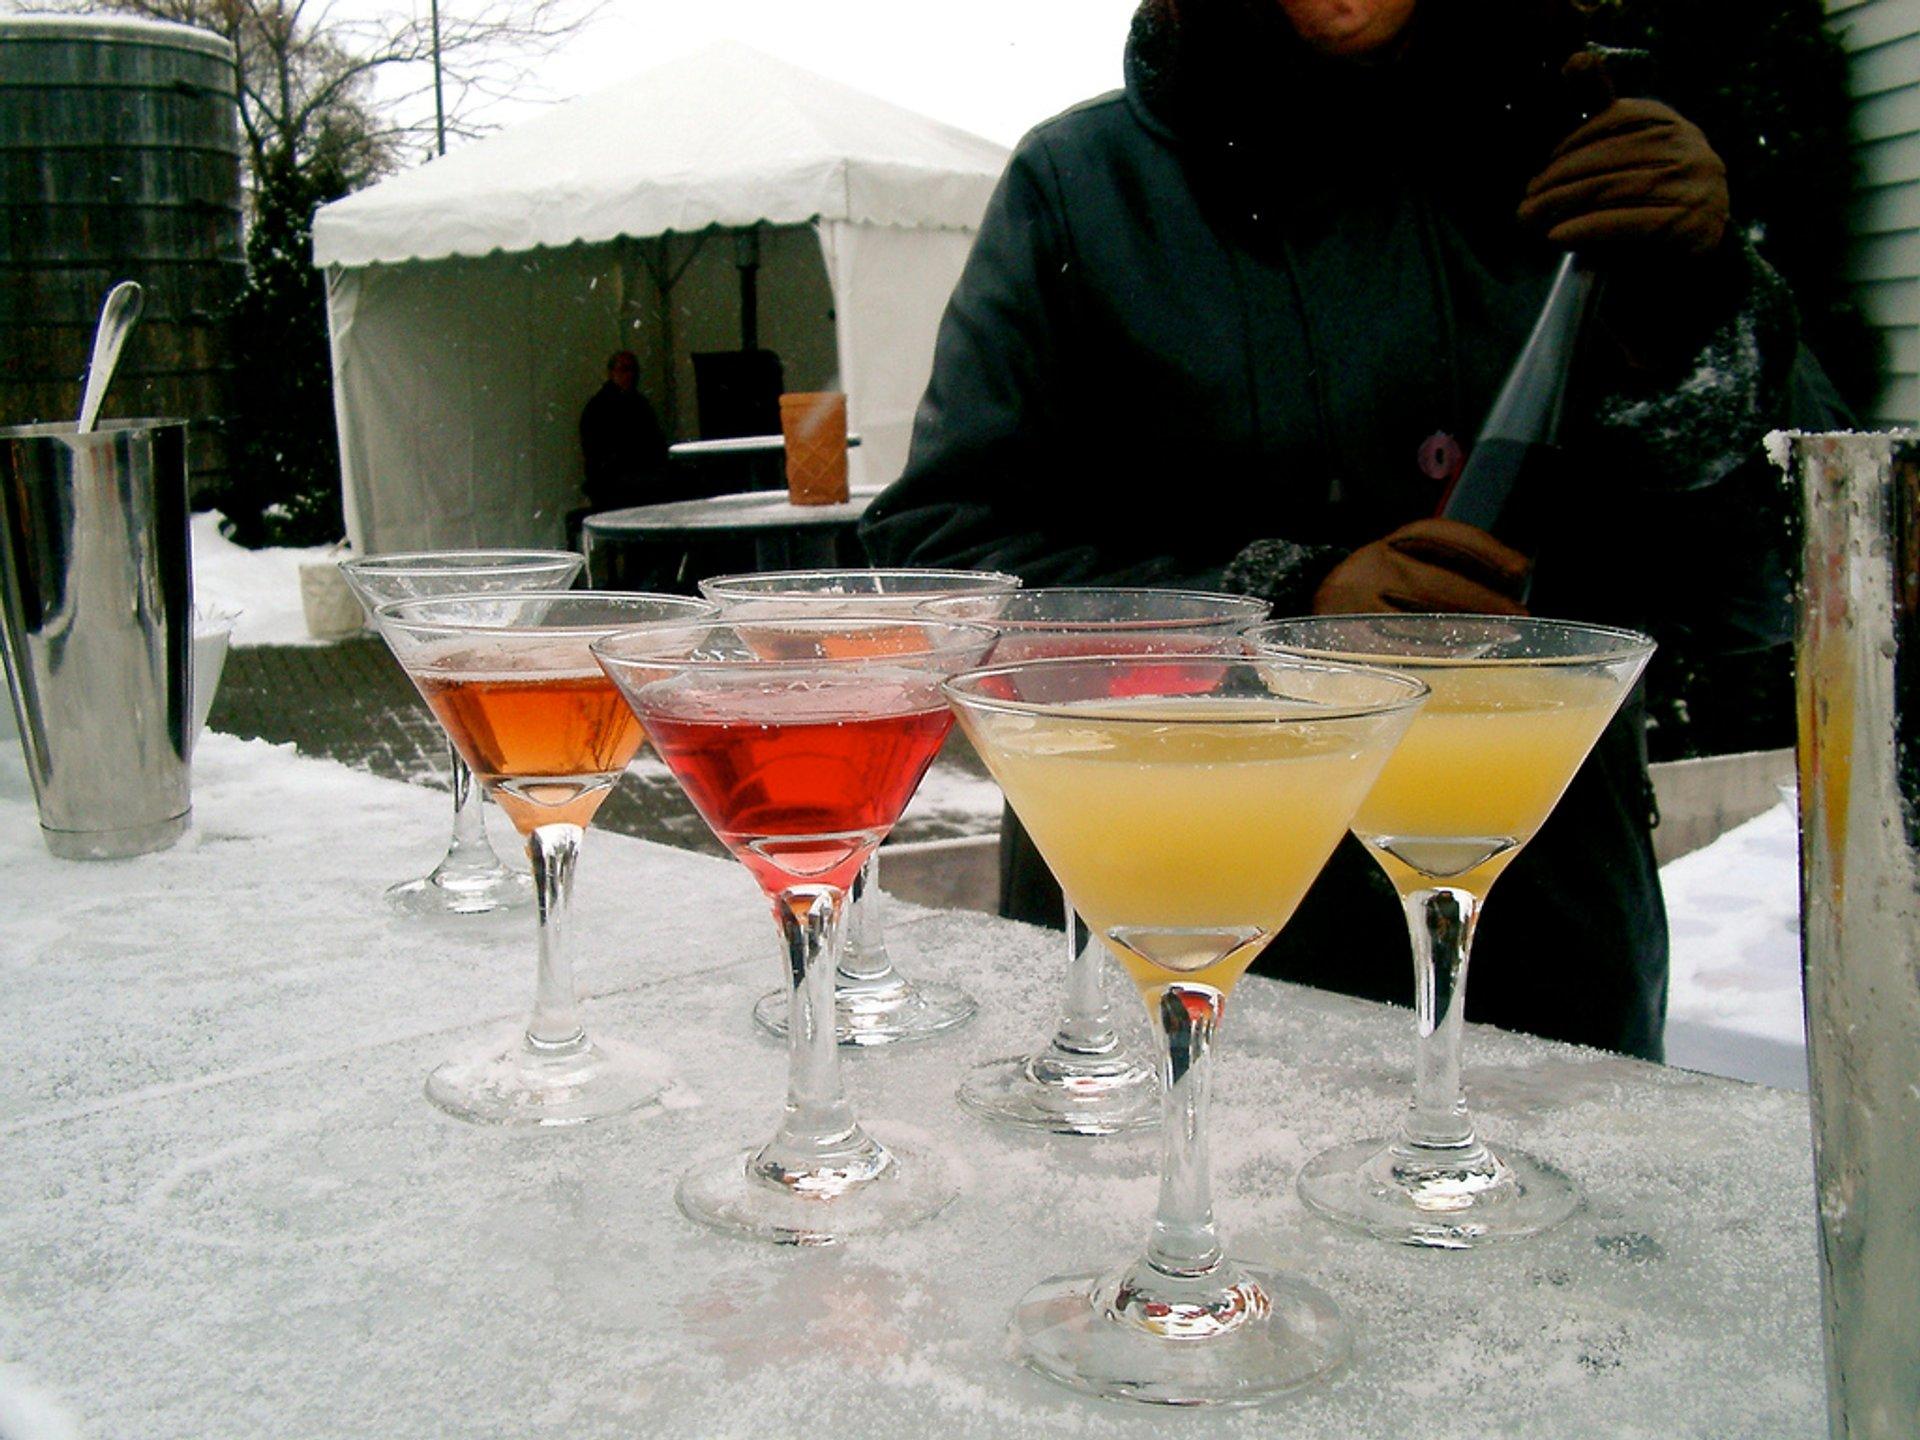 Niagara Icewine Festival in Niagara Falls - Best Time